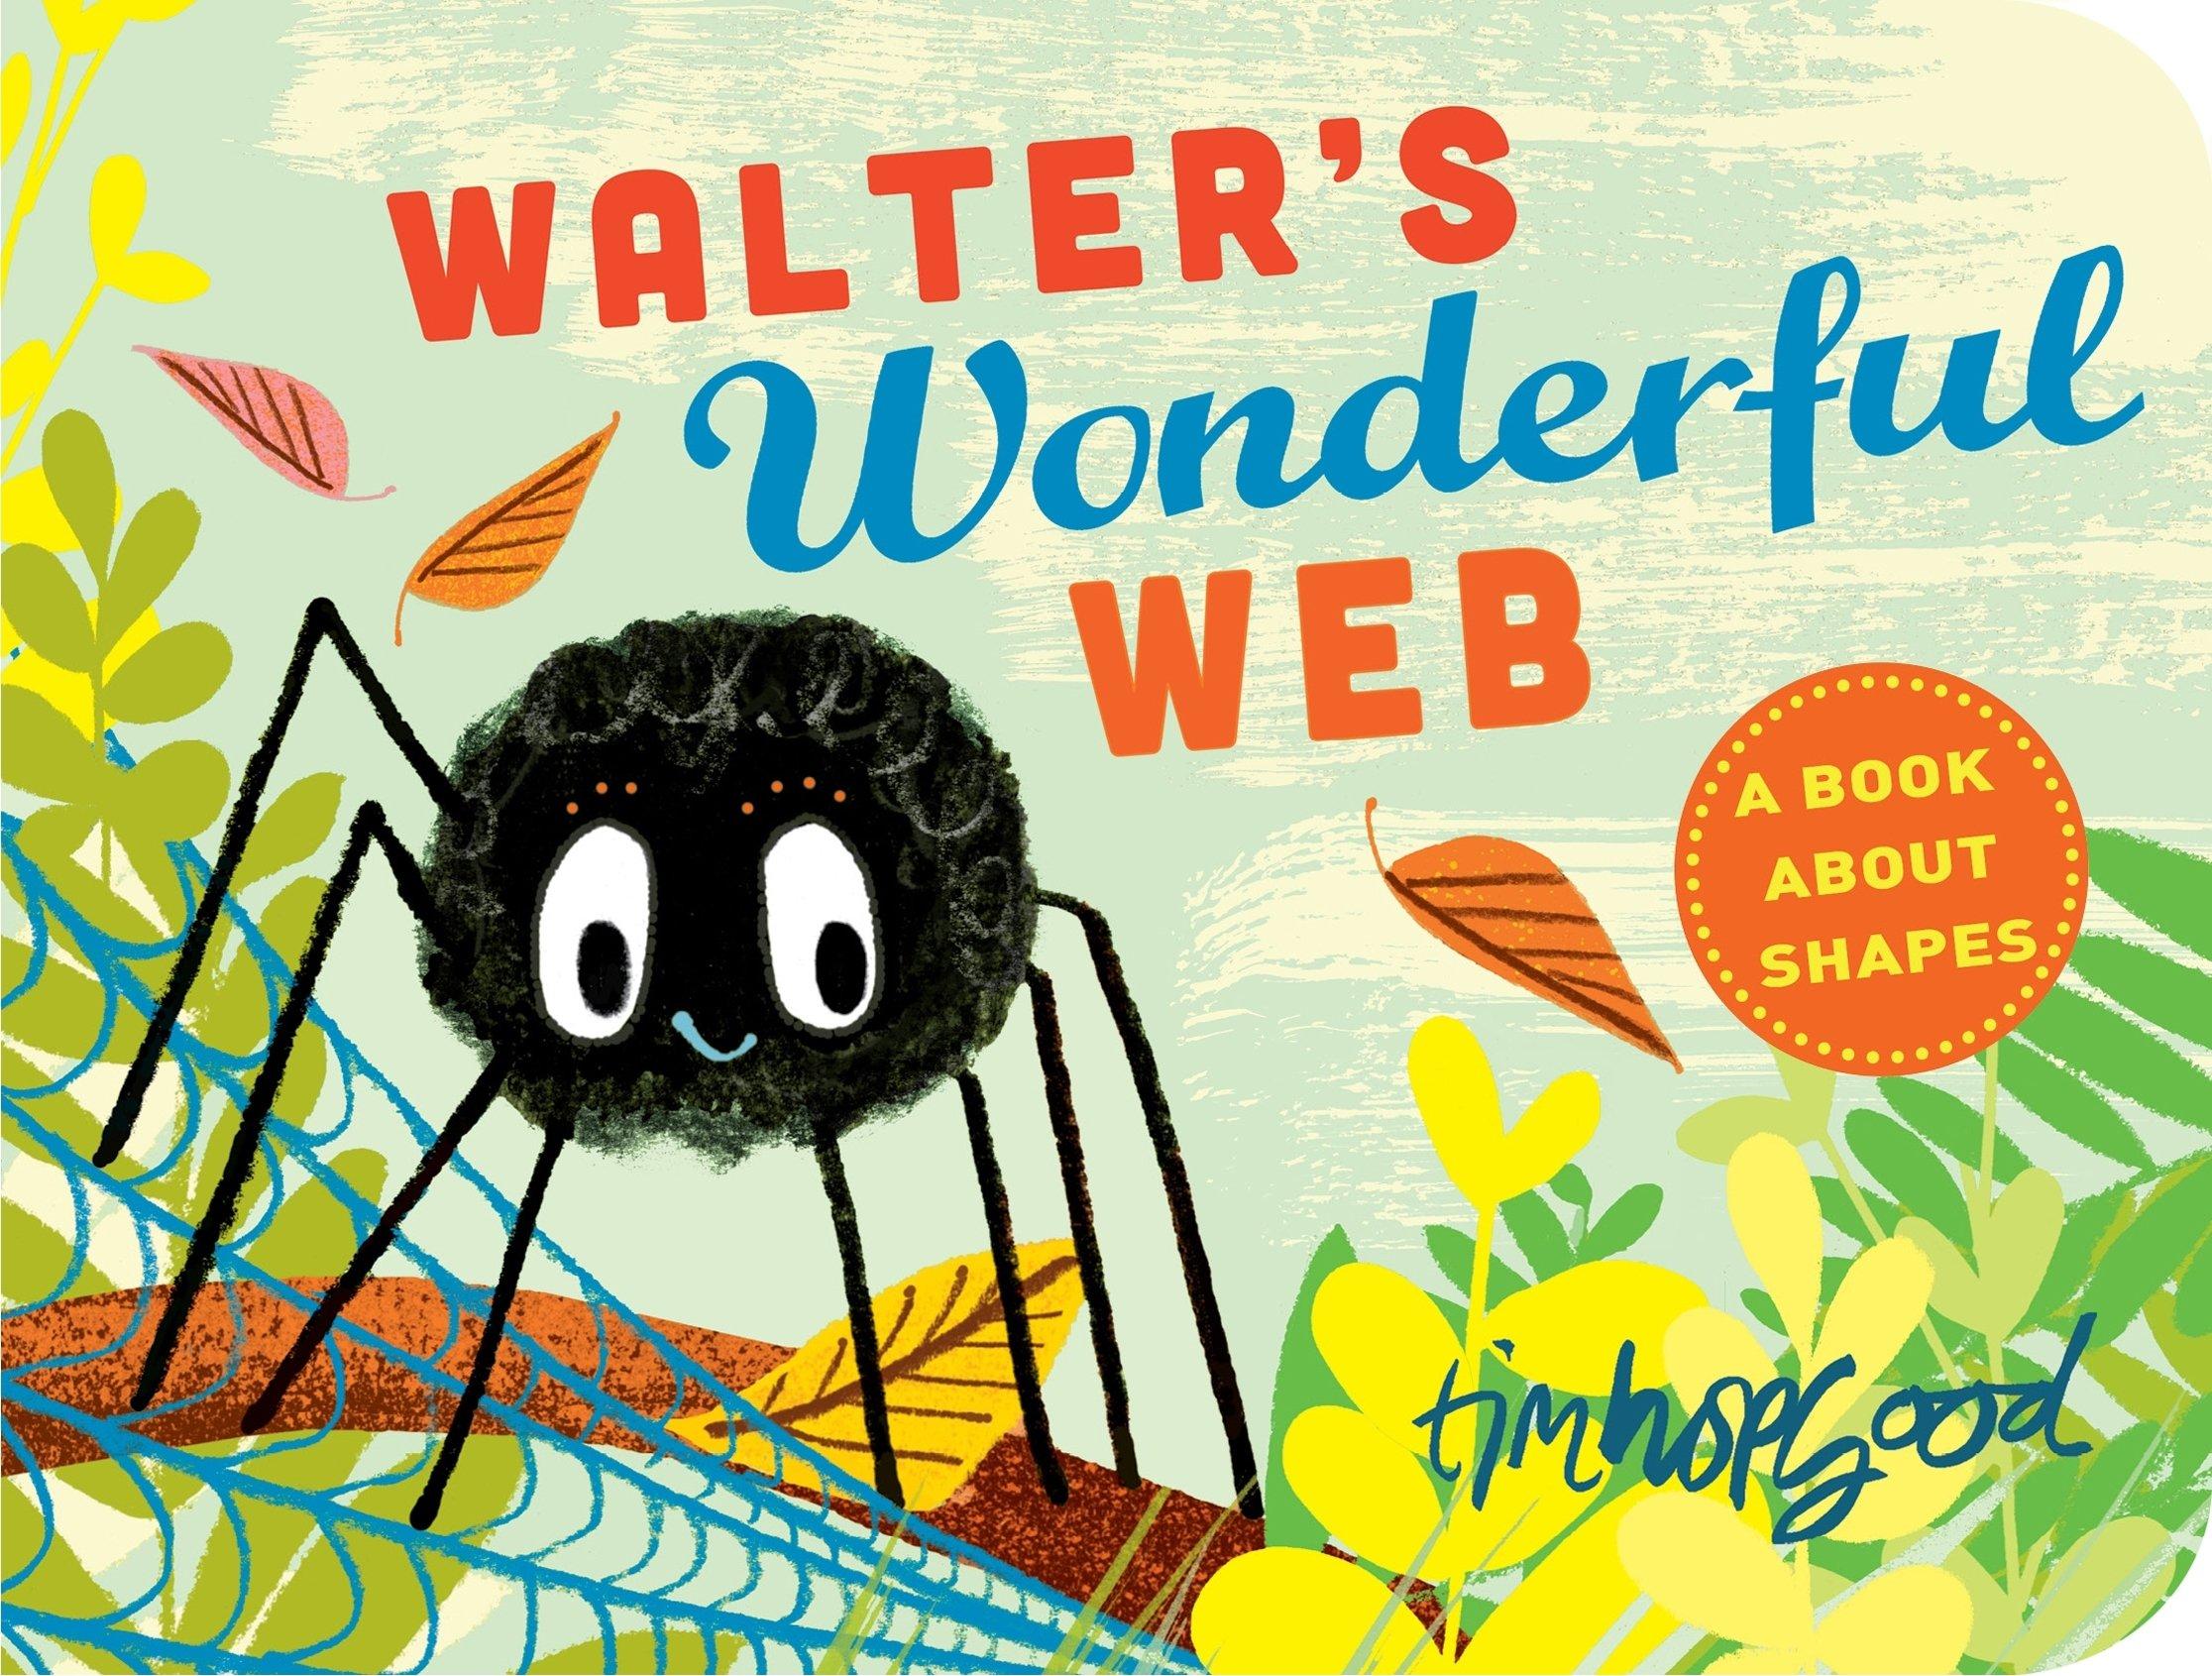 Walter's Wonderful Web: Amazon.co.uk: Hopgood, Tim: 9781447277101: Books